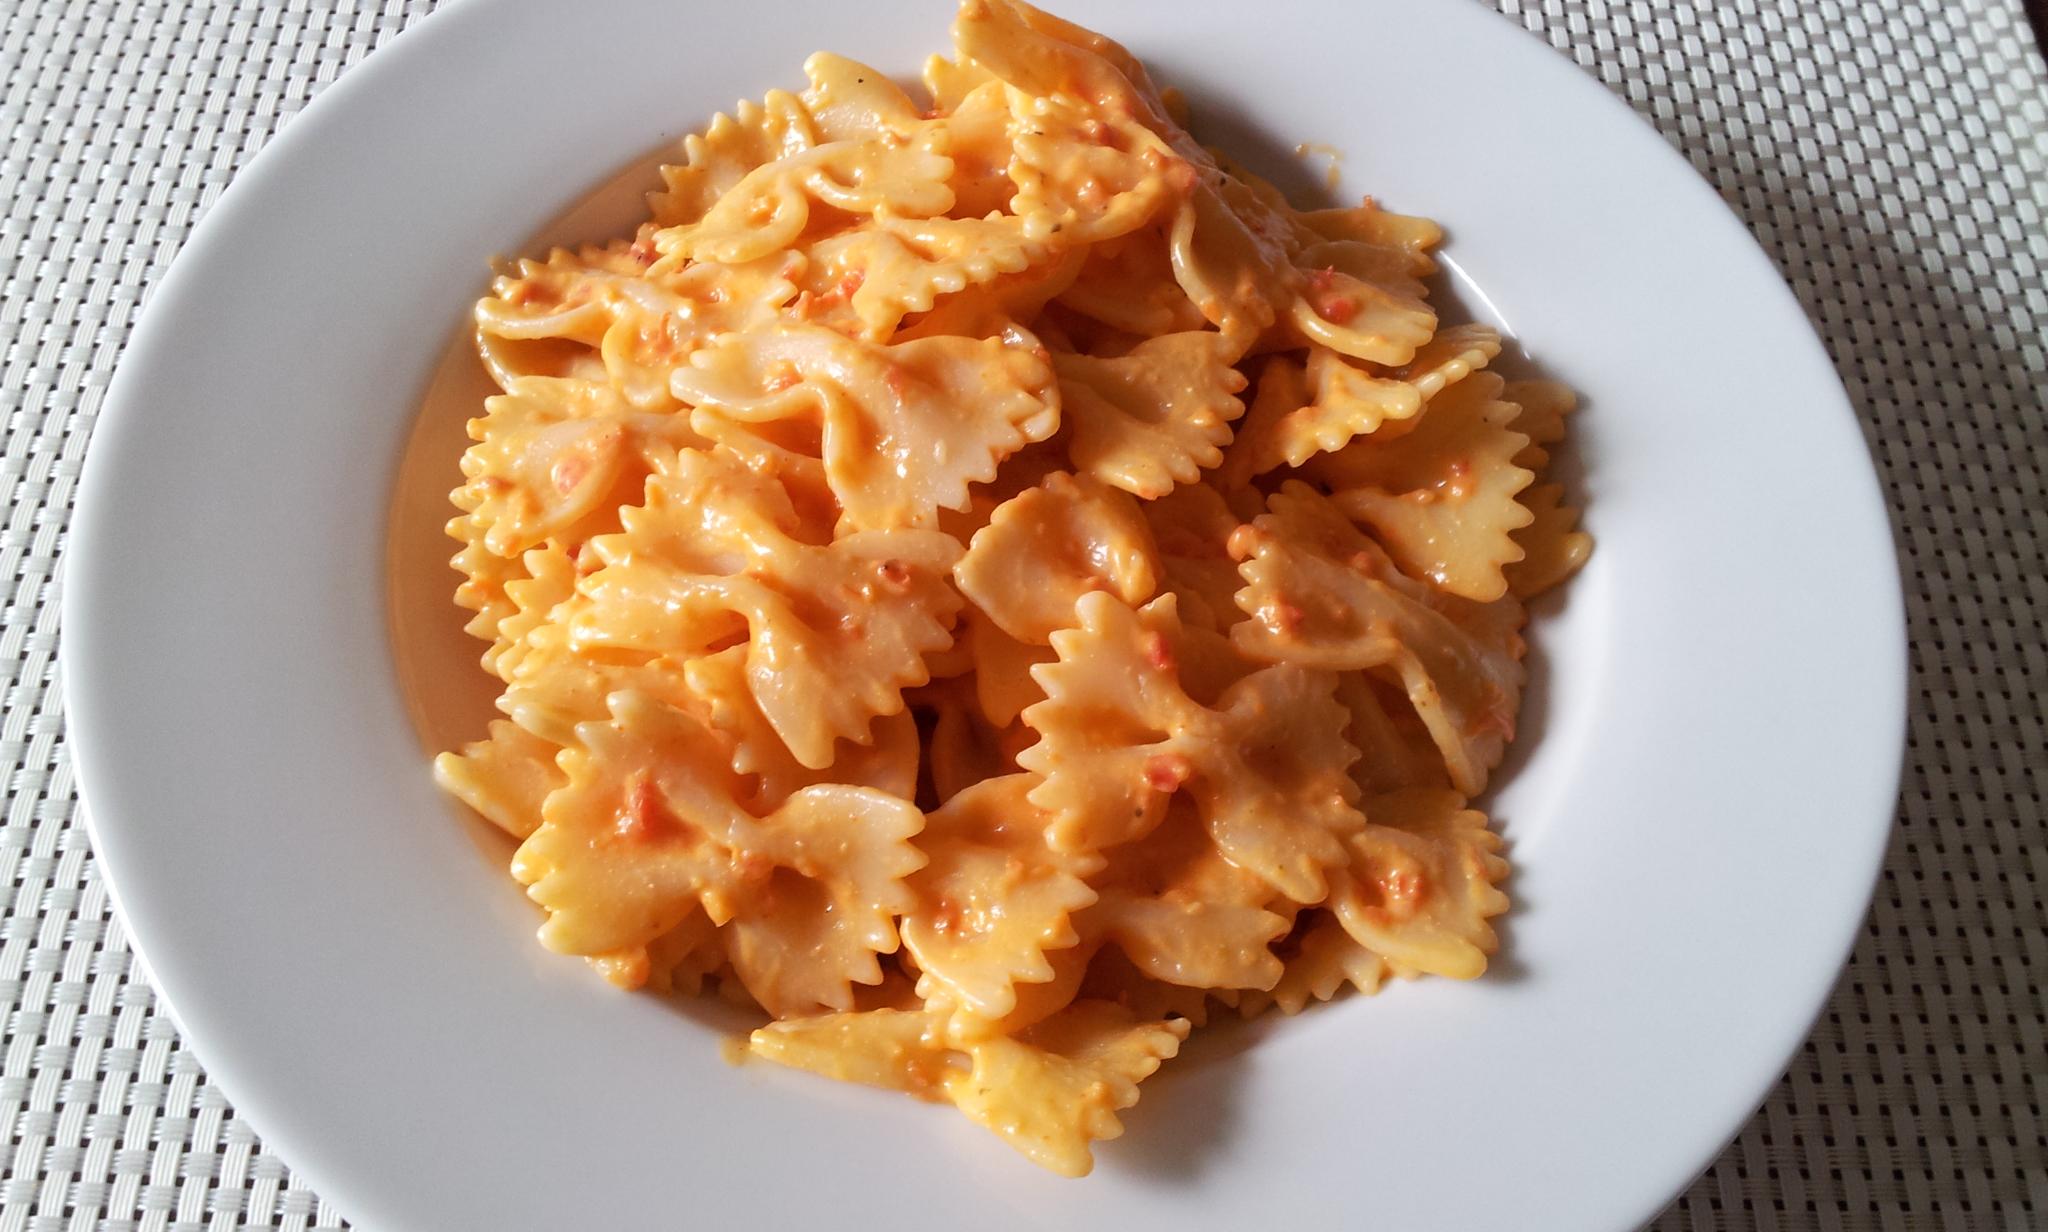 https://foodloader.net/Holz_2013-07-30_Farfalle_Calabrese.jpg